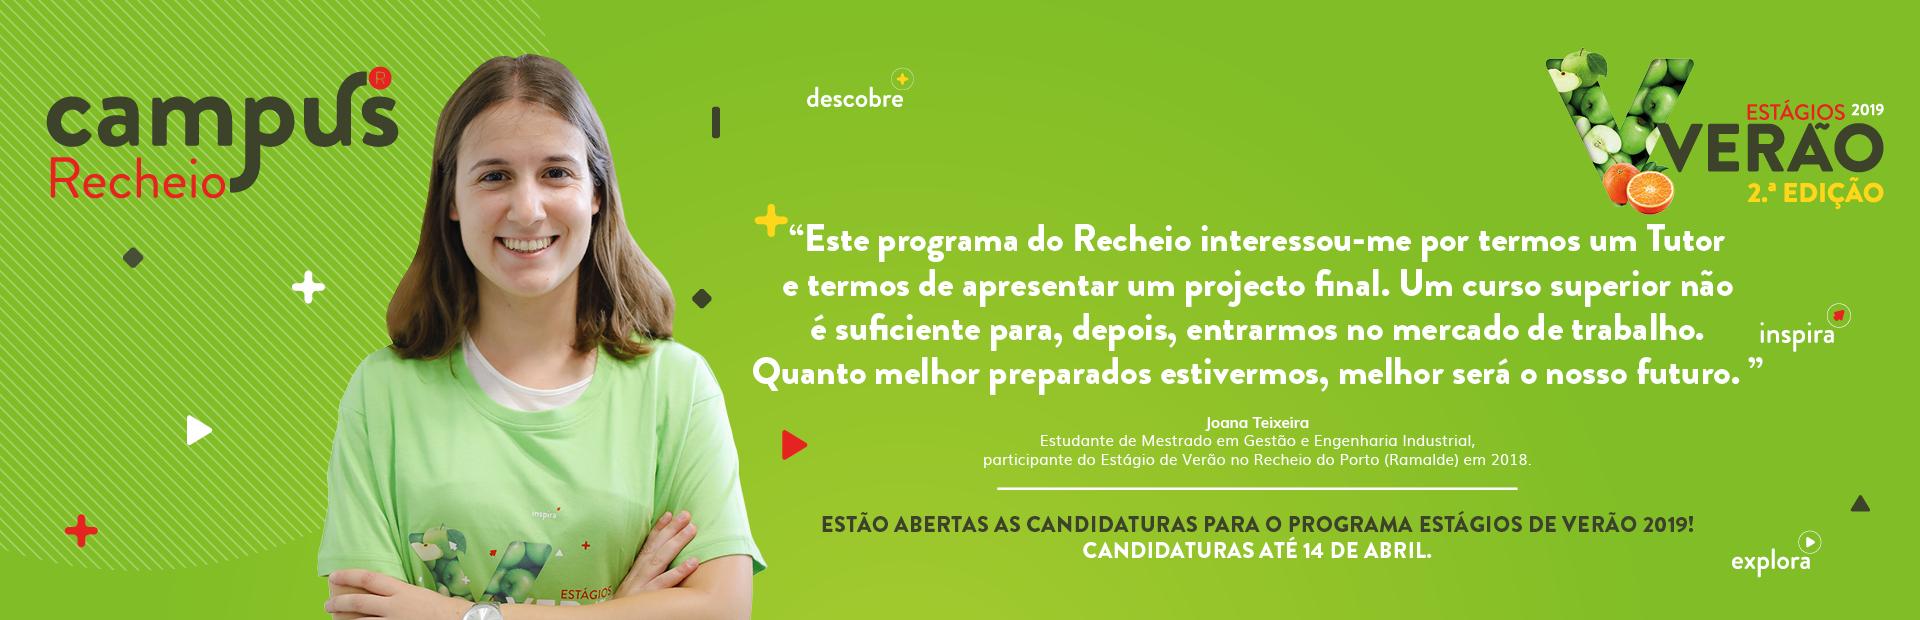 Recheio_campus_verao_Site_1920x620px_joana